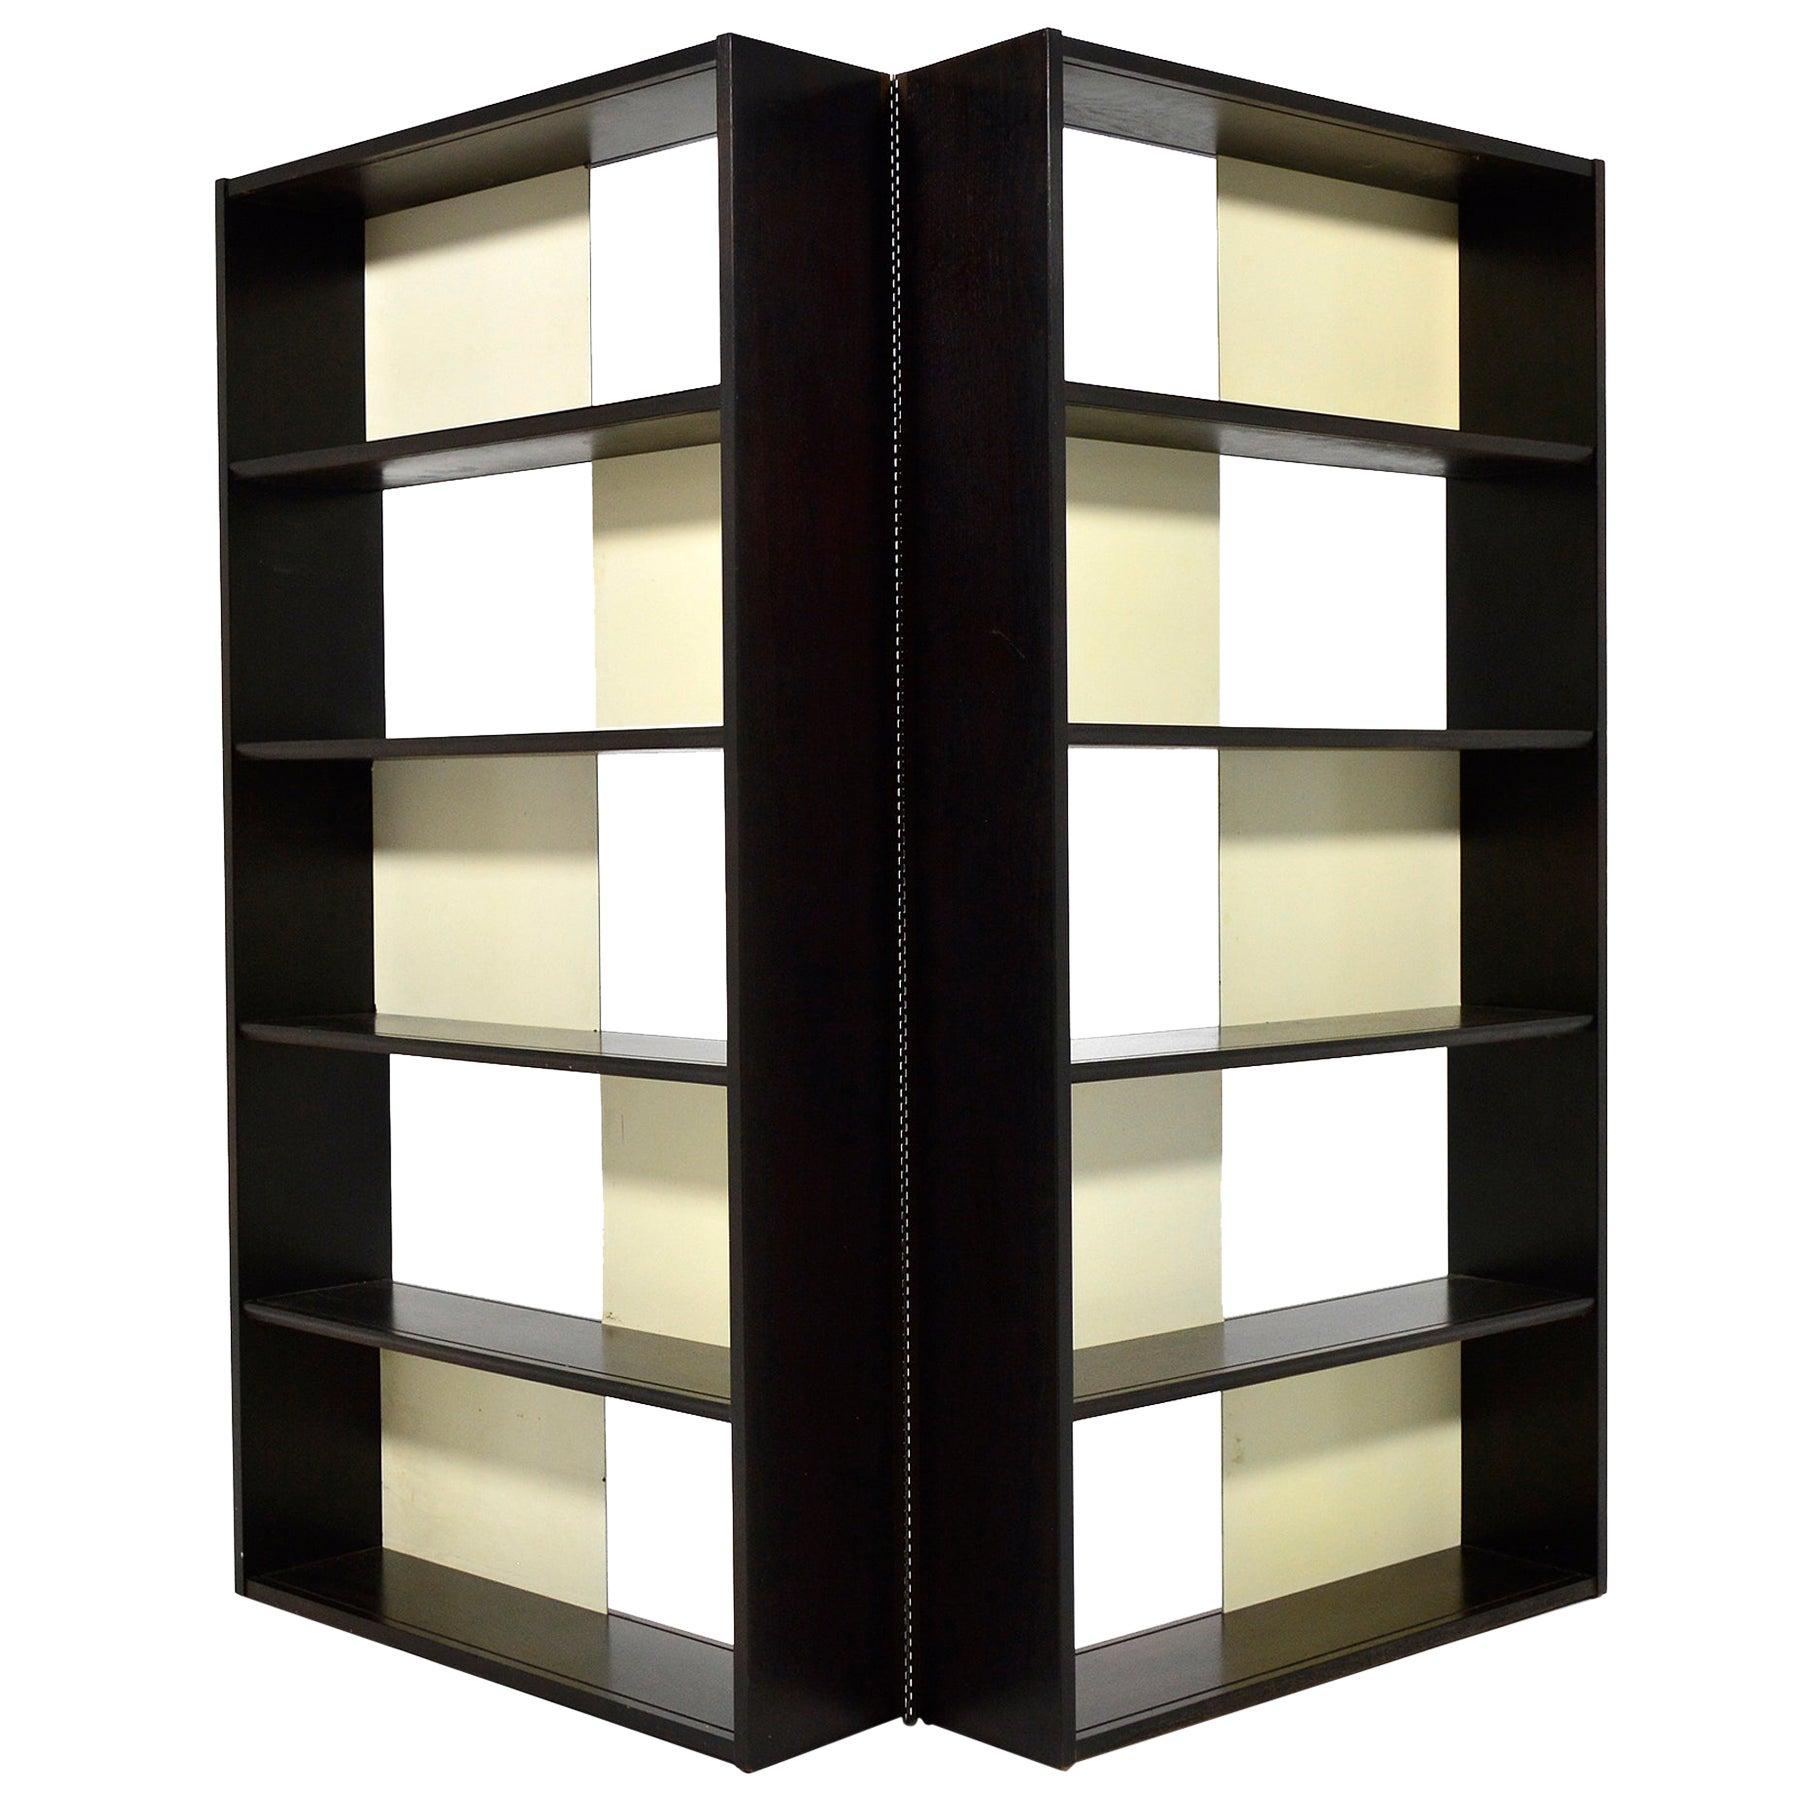 Glenn of California Folding Bookcase/ Display Shelf/ Room Divider